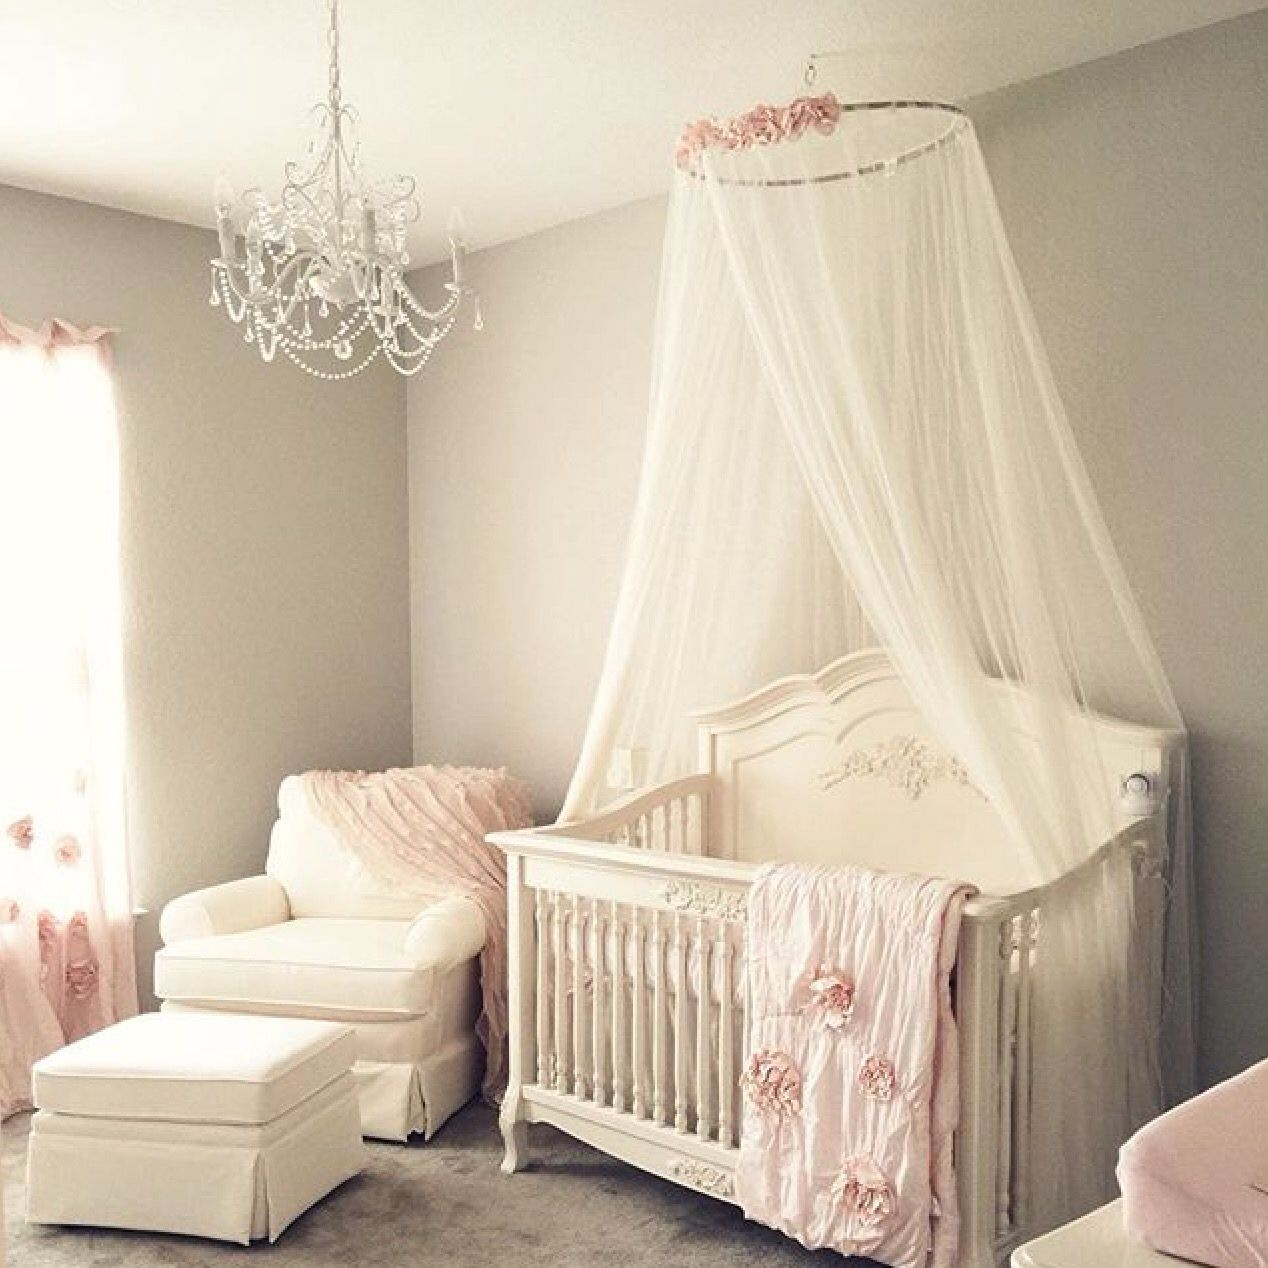 Delightful Newborn Baby Room Decorating Ideas: Girl Nursery, Baby Room